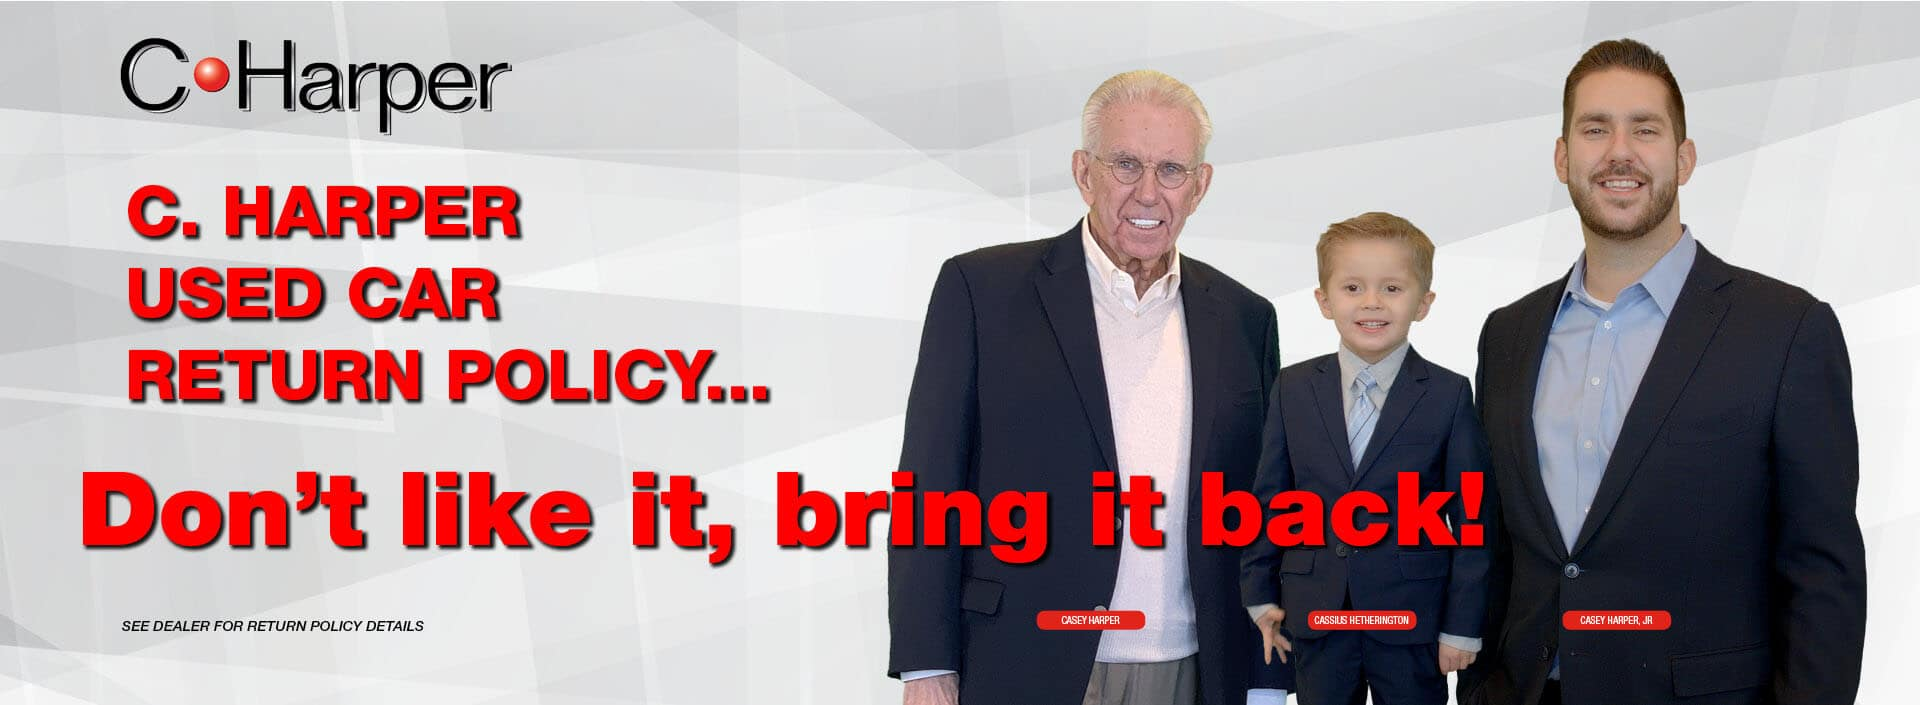 C. Harper Used Car Return Policy